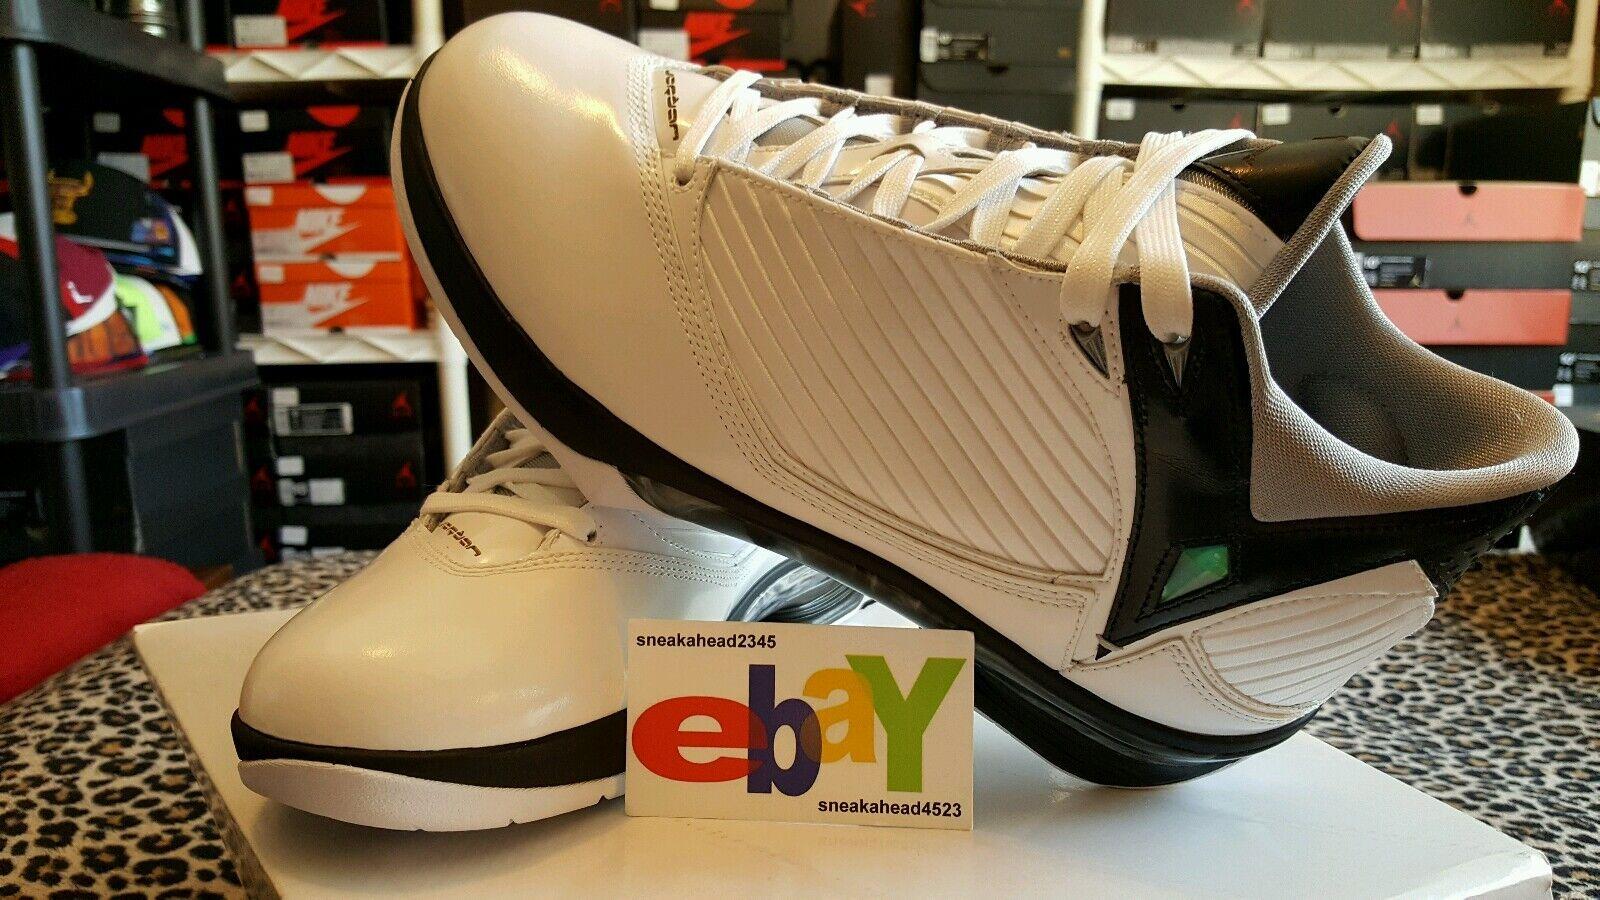 Nike Air Jordan 2009 2K9 S23 12 04 2008 WHITE METALLIC SILVER-BLACK 343084 161